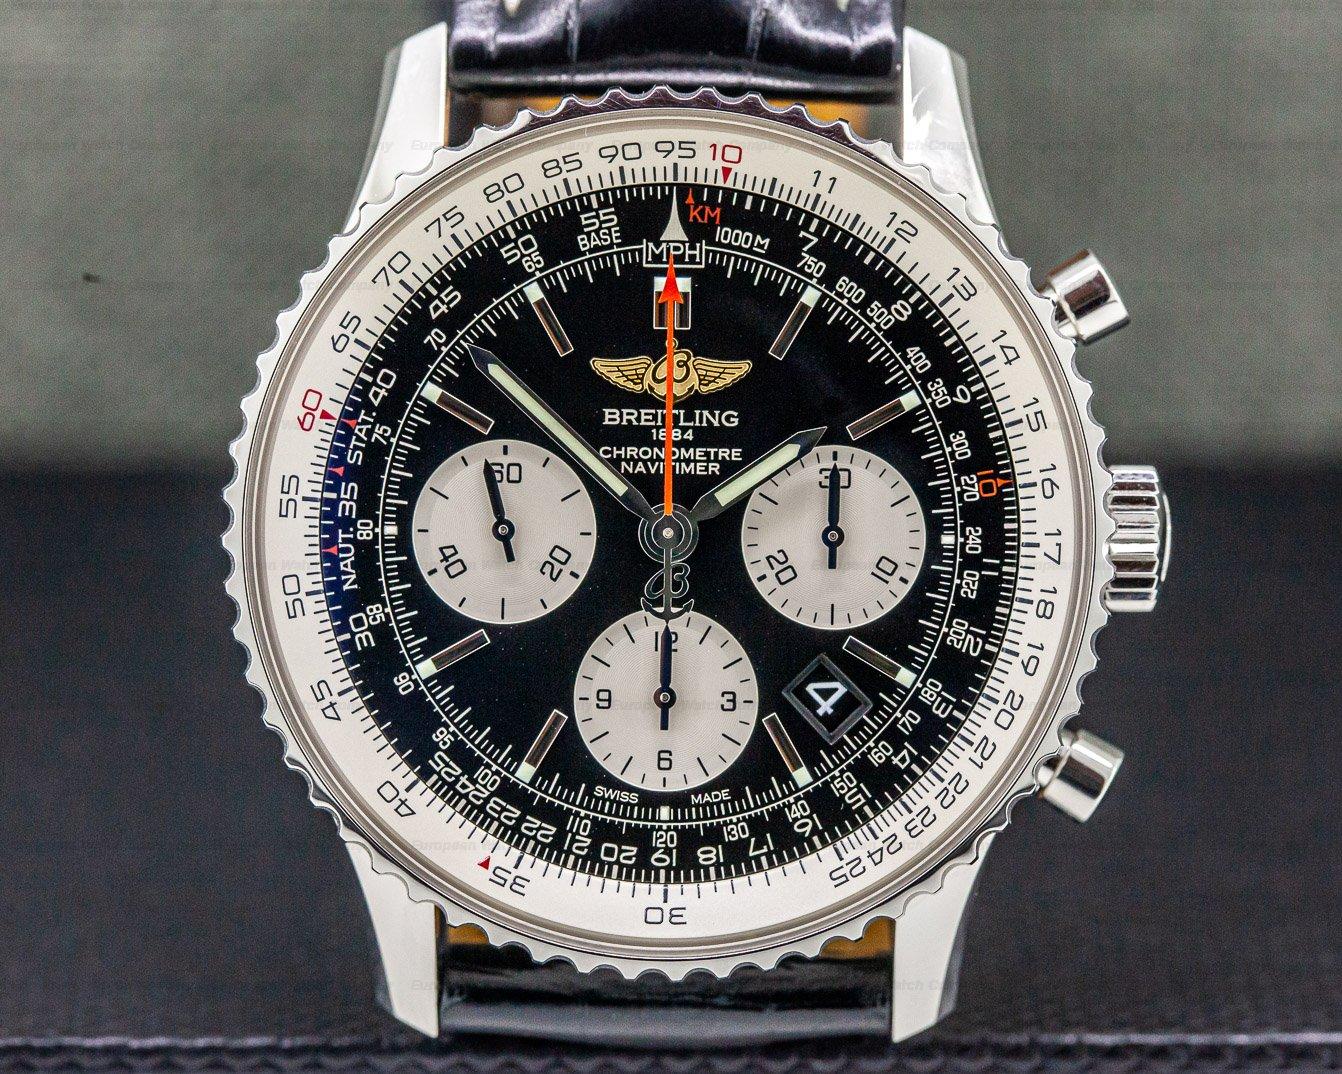 Breitling AB012012/BB01 Navitimer 01 Chronograph Black Dial Black Leather